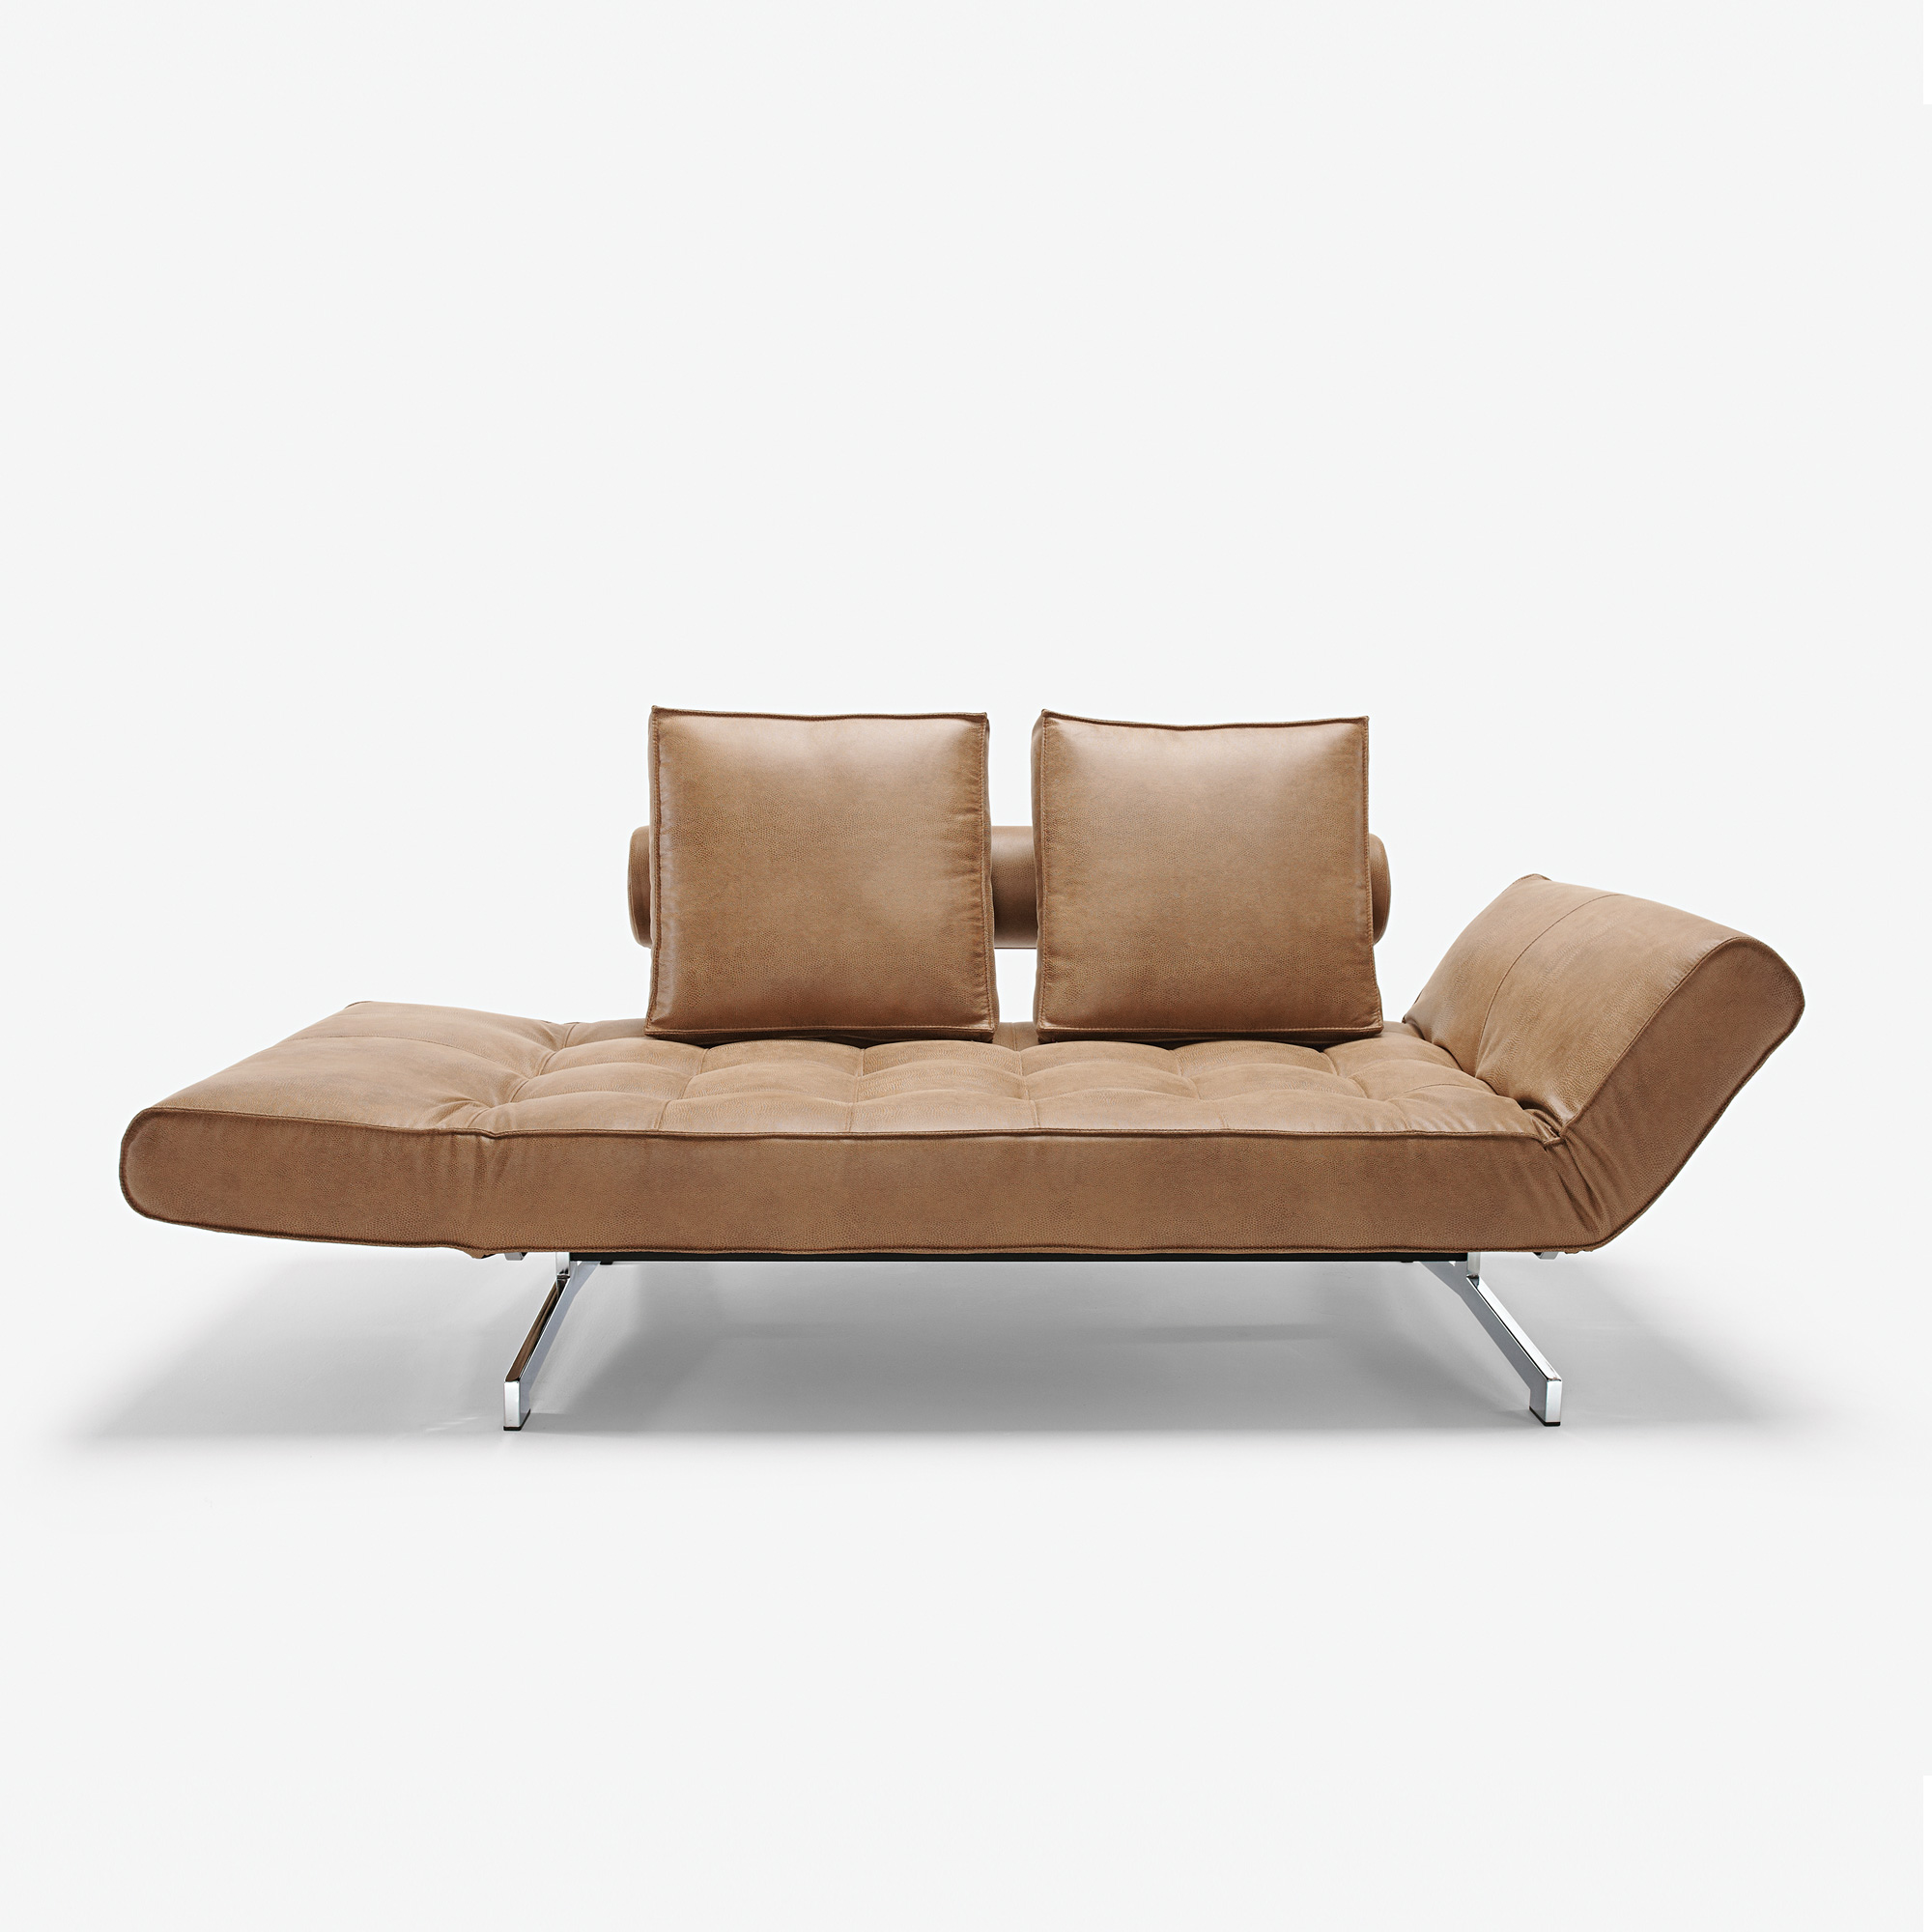 innovation ghia schlafsofa 94 743020551 0 2 reuter. Black Bedroom Furniture Sets. Home Design Ideas